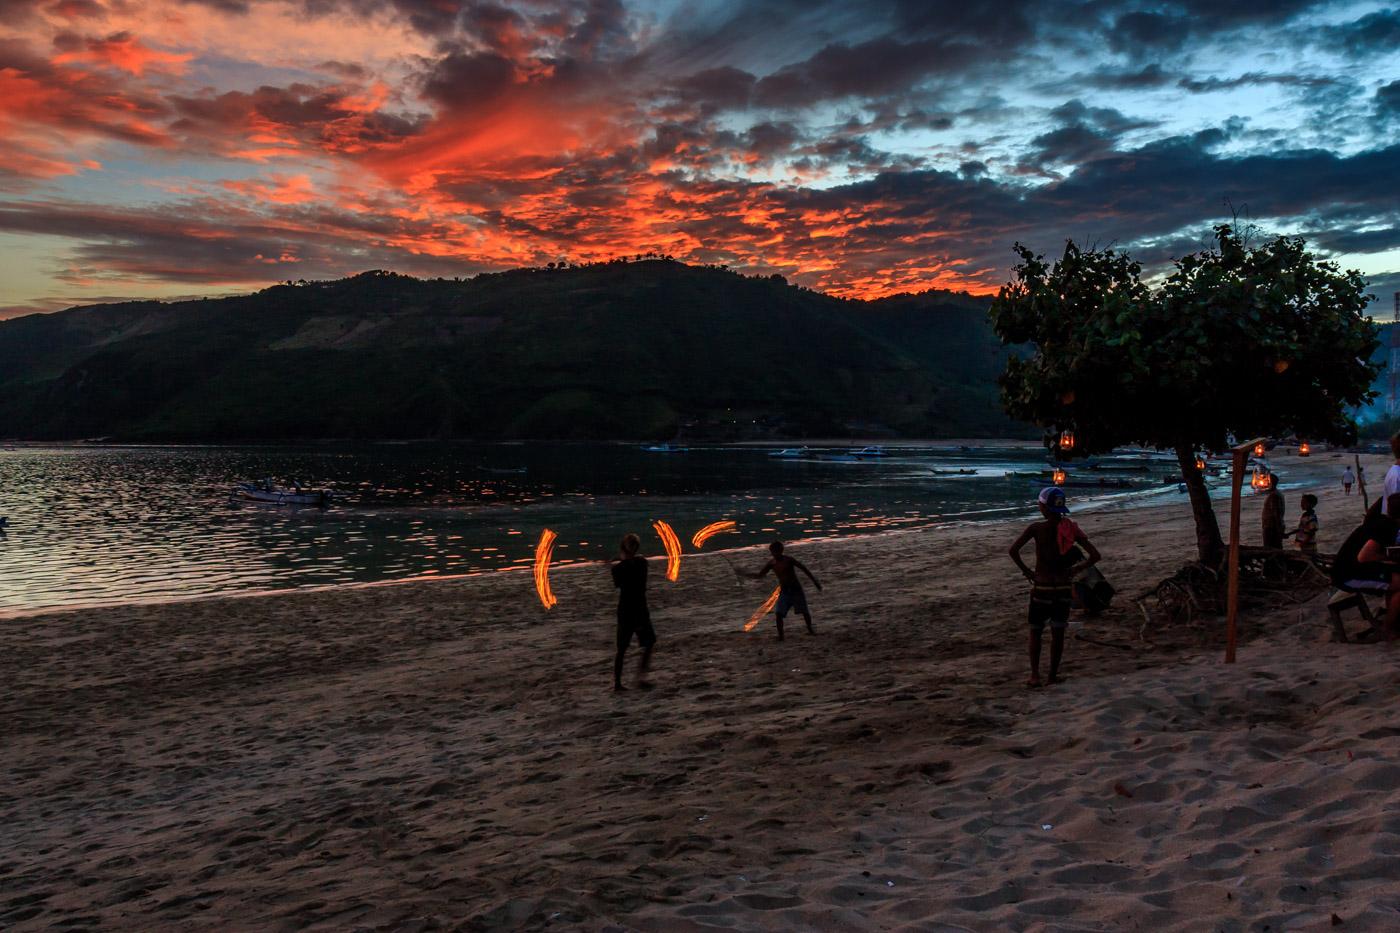 Fire dancers on the beach.